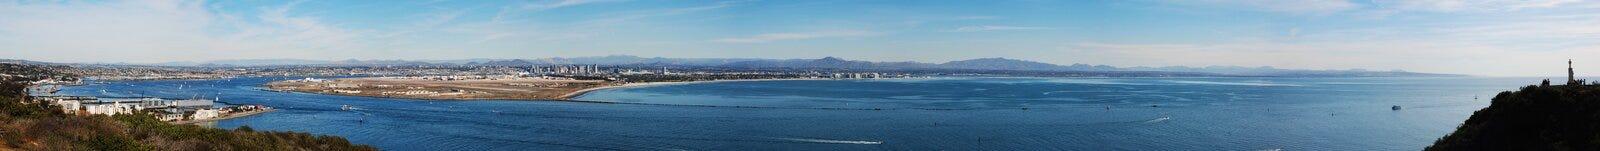 Full view of San Diego Stock Photos